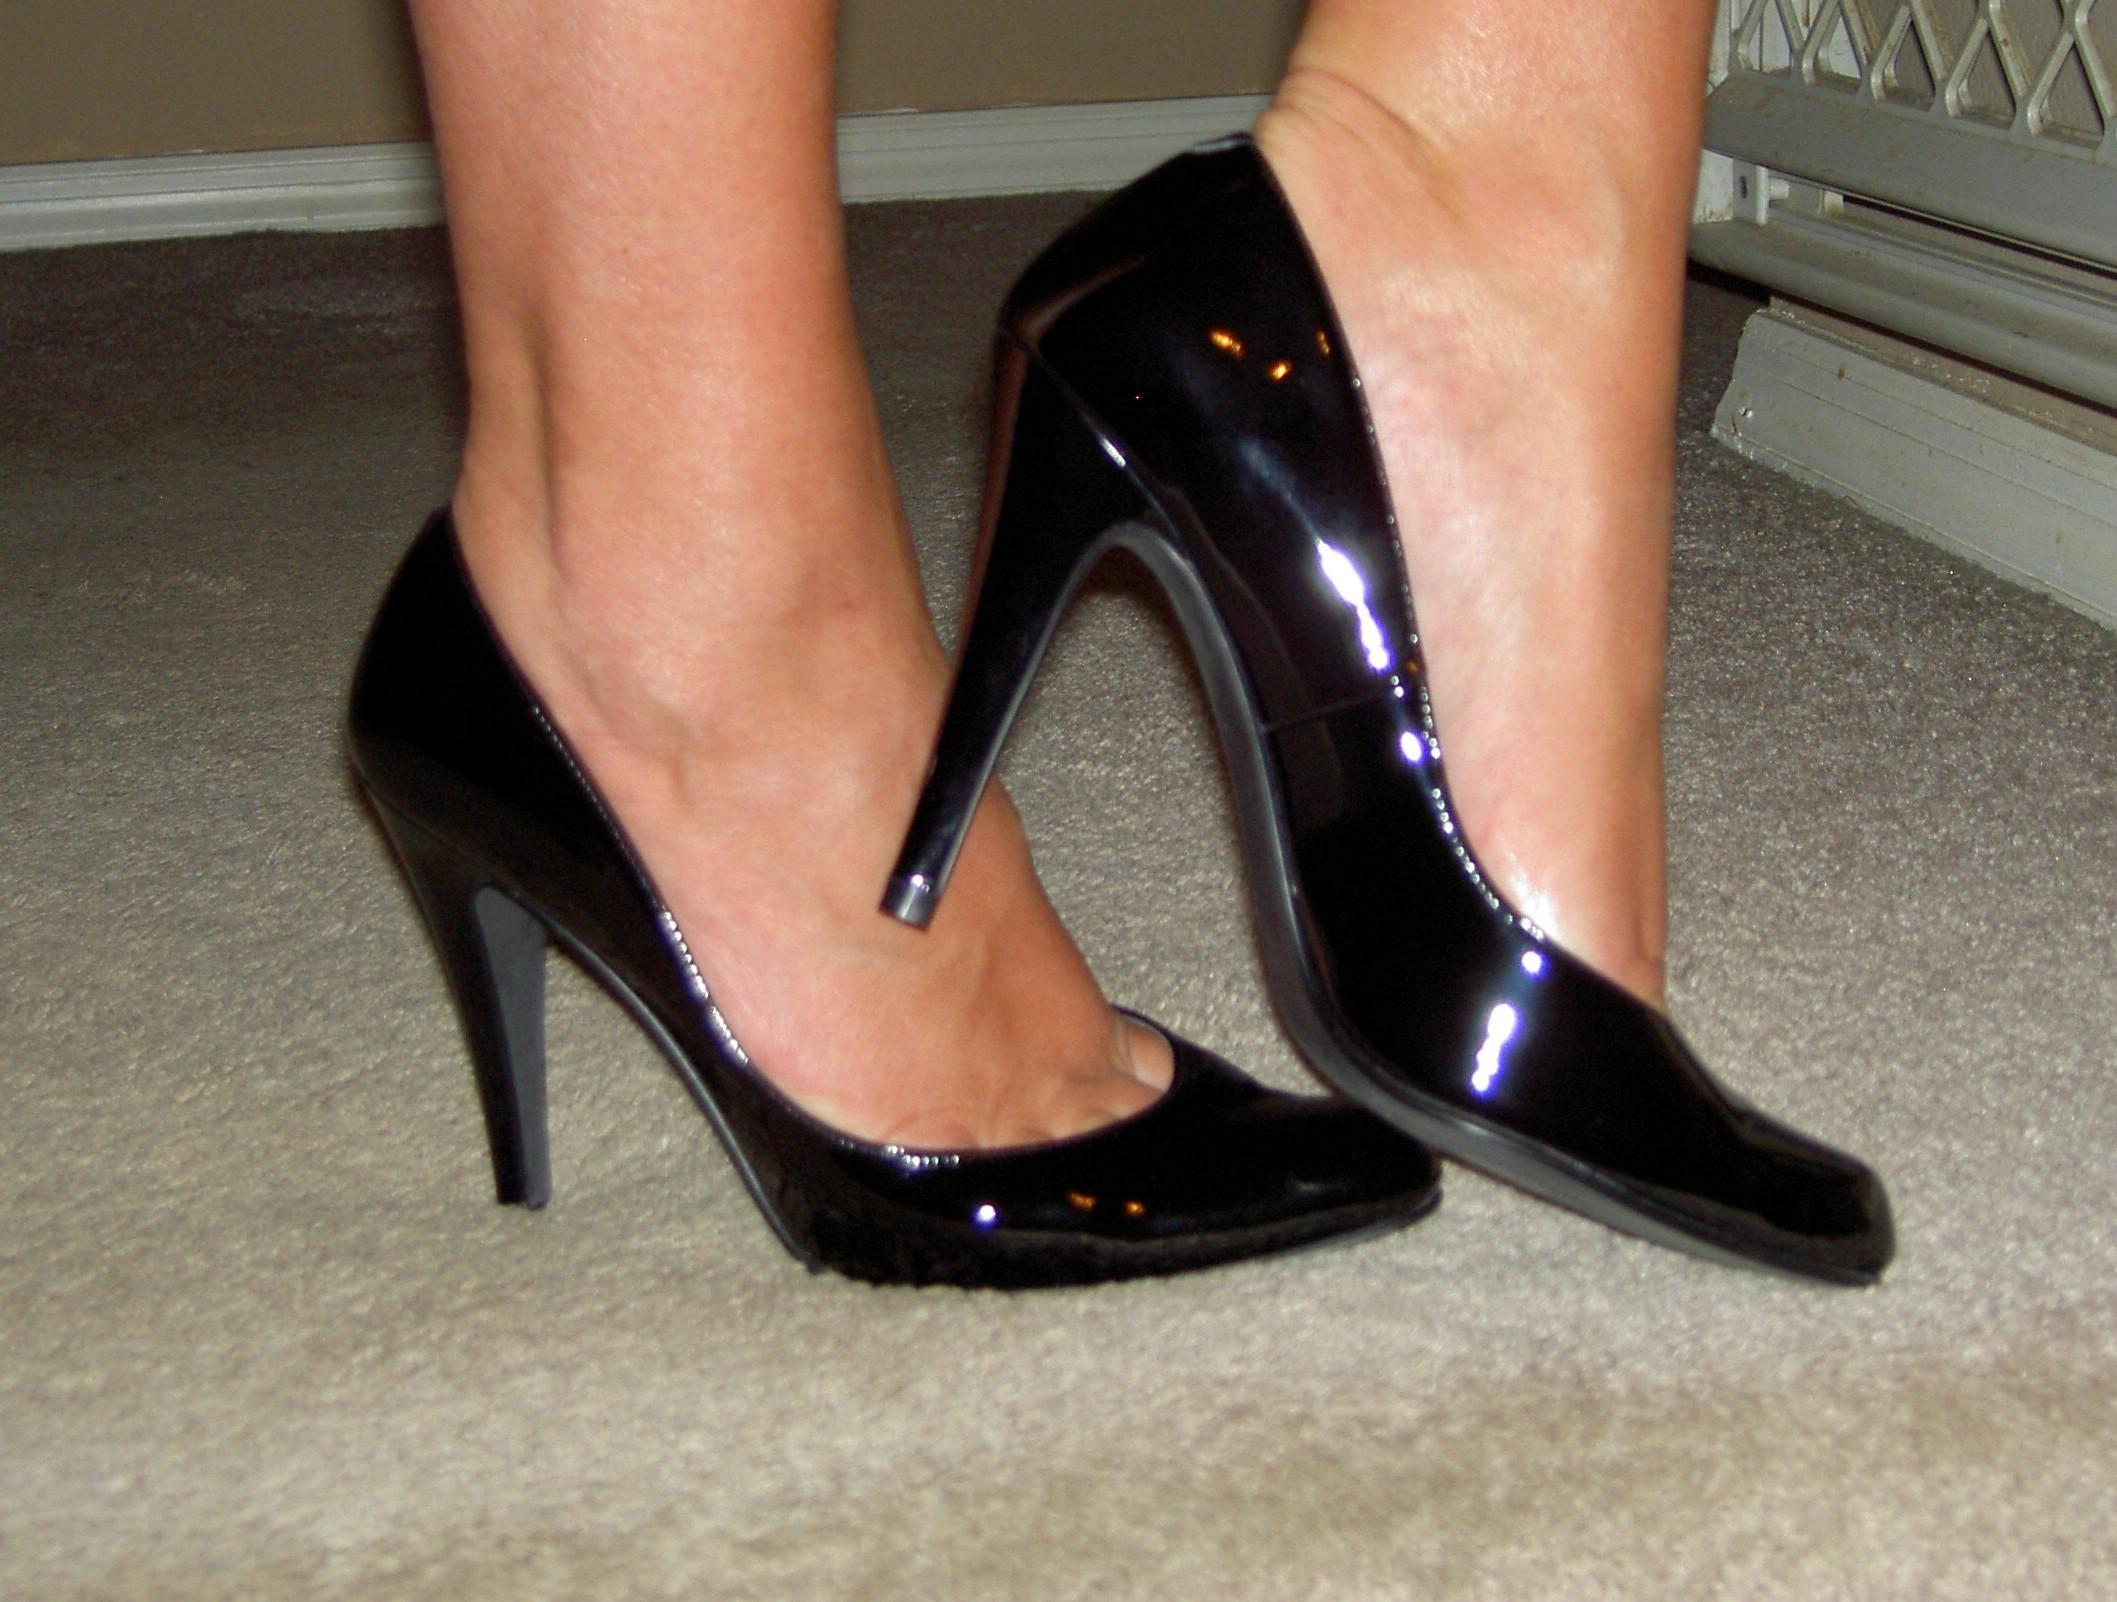 How To Prevent Carpet Wear From Shoes Zerorez Atlanta